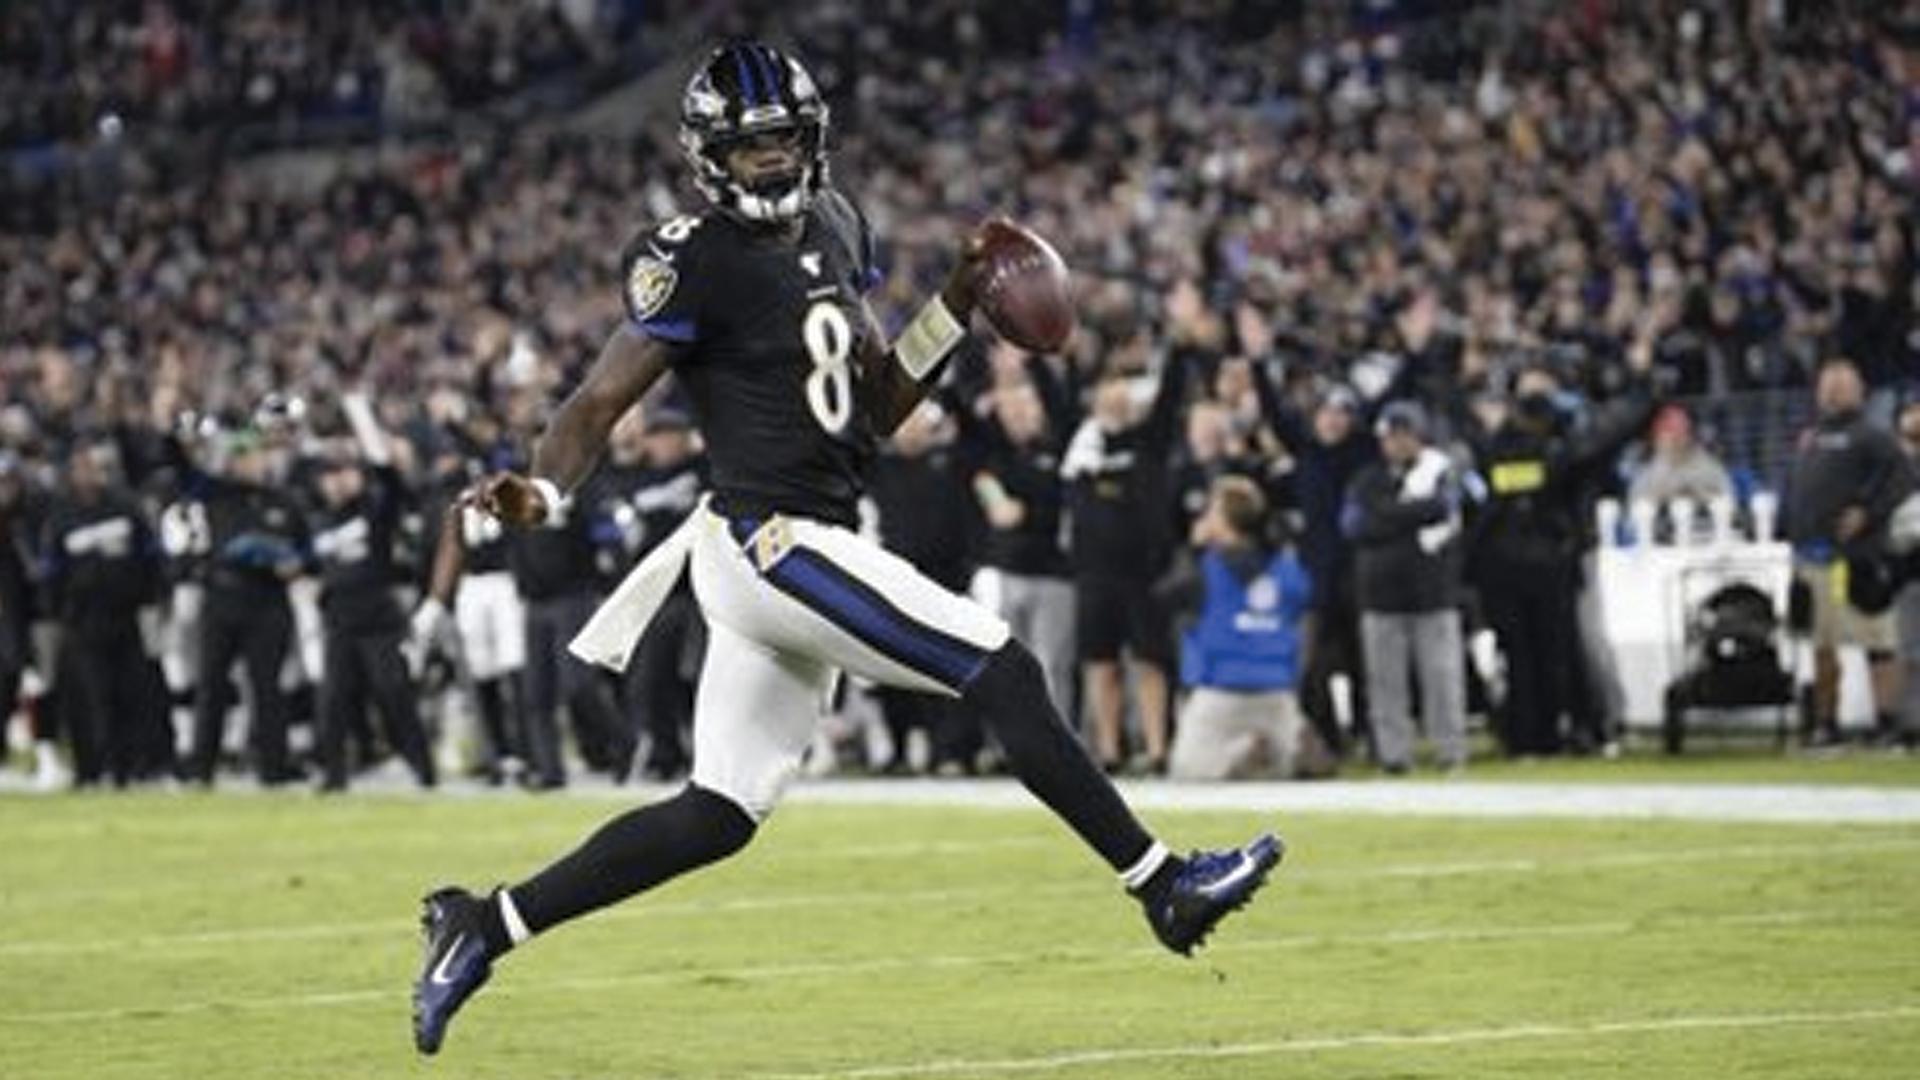 NFL: Ravens de Baltimore derrotó 42-21 a Jets de Nueva York